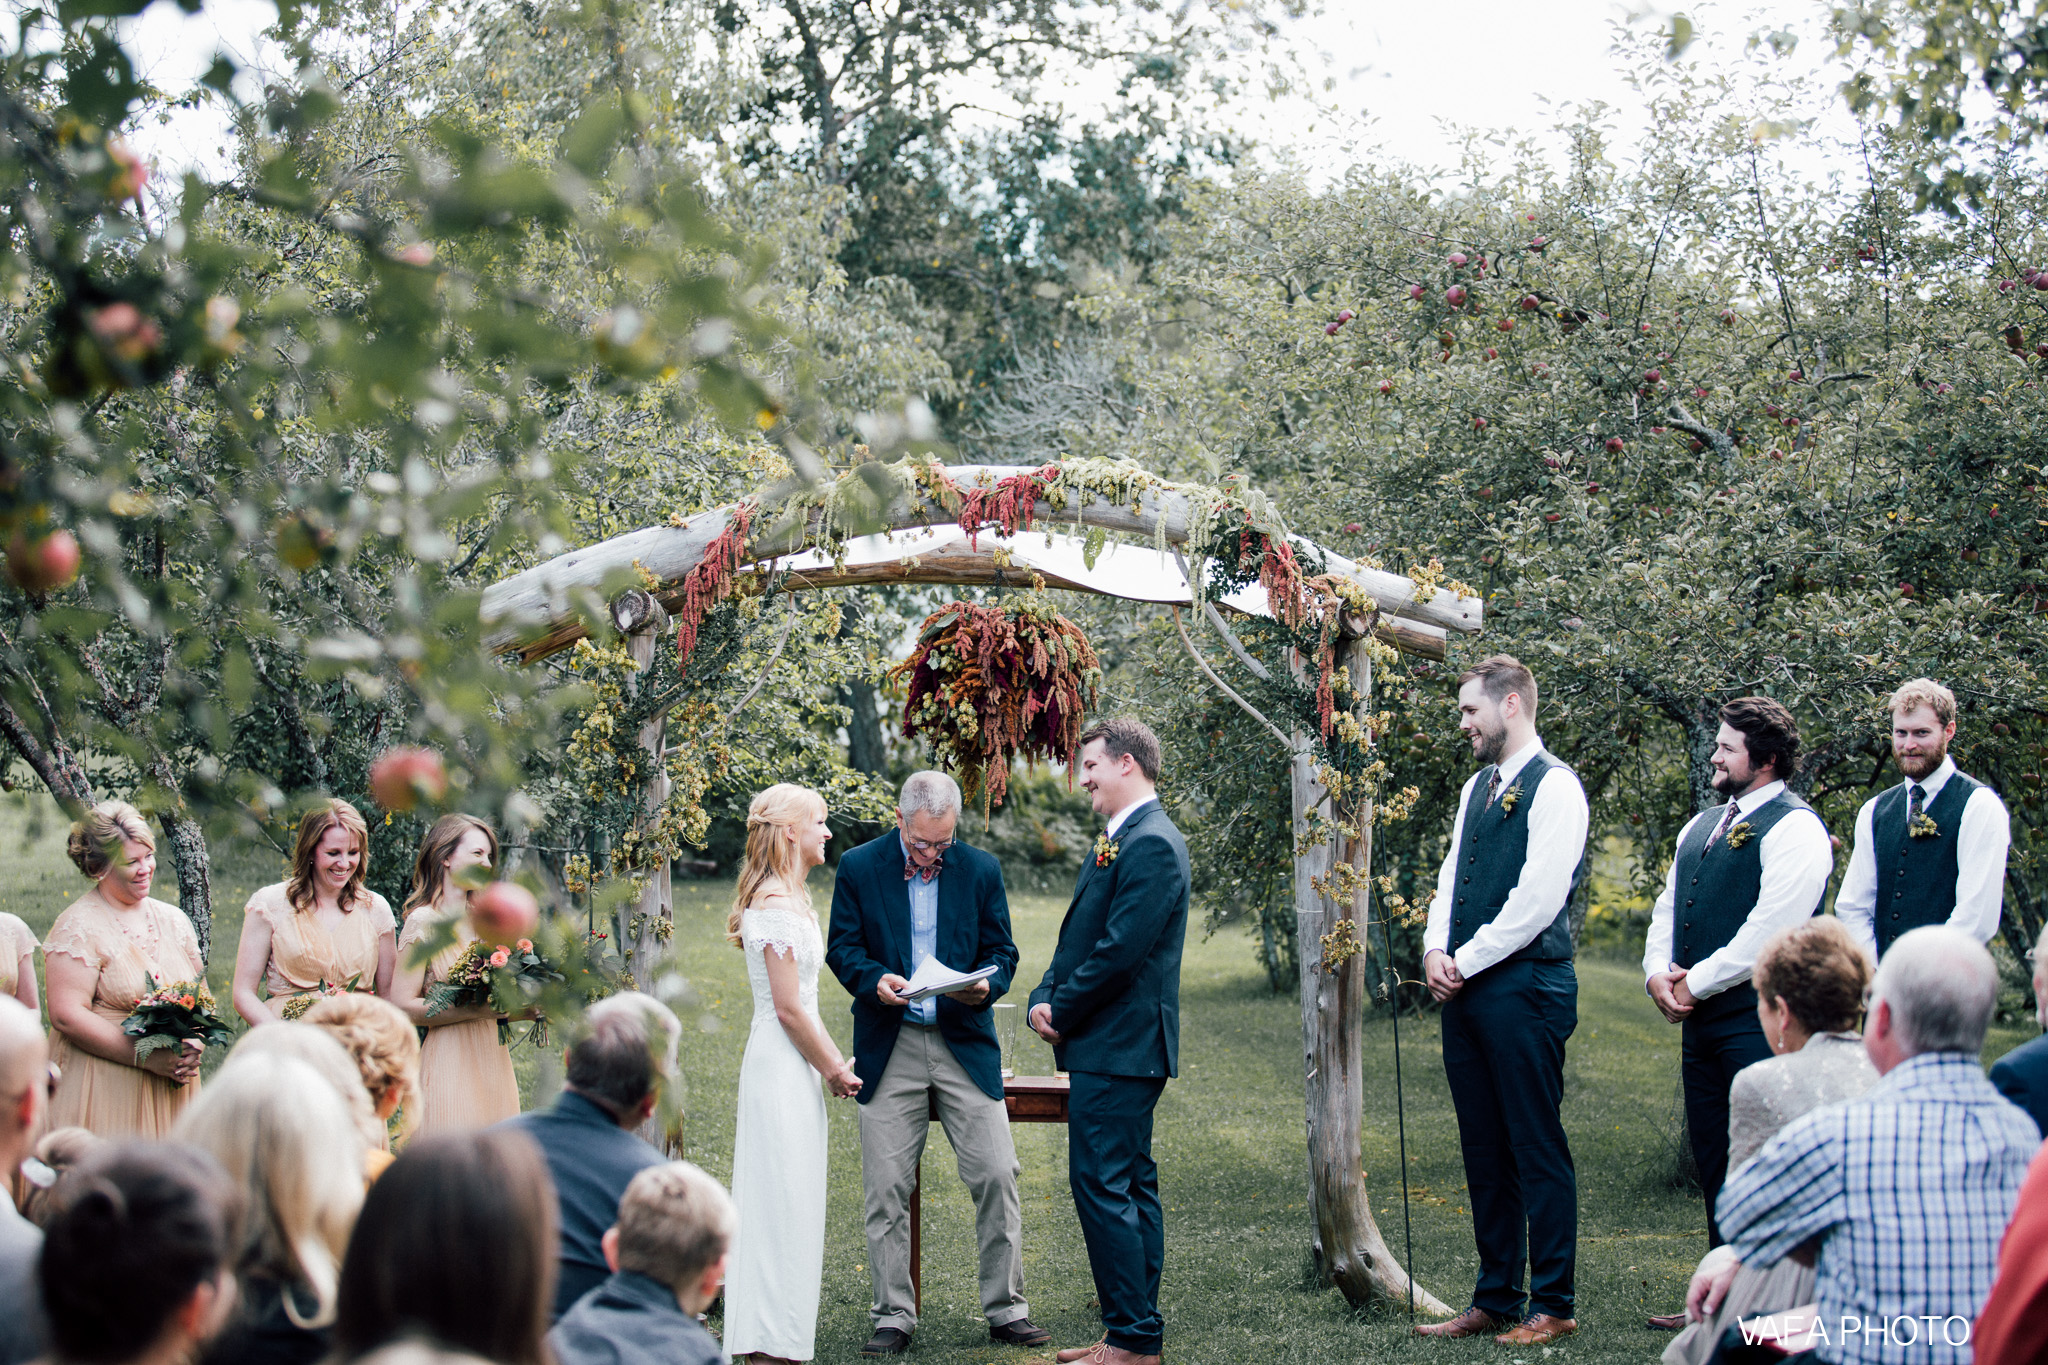 Belsolda-Farm-Wedding-Christy-Eric-Vafa-Photo-477.jpg